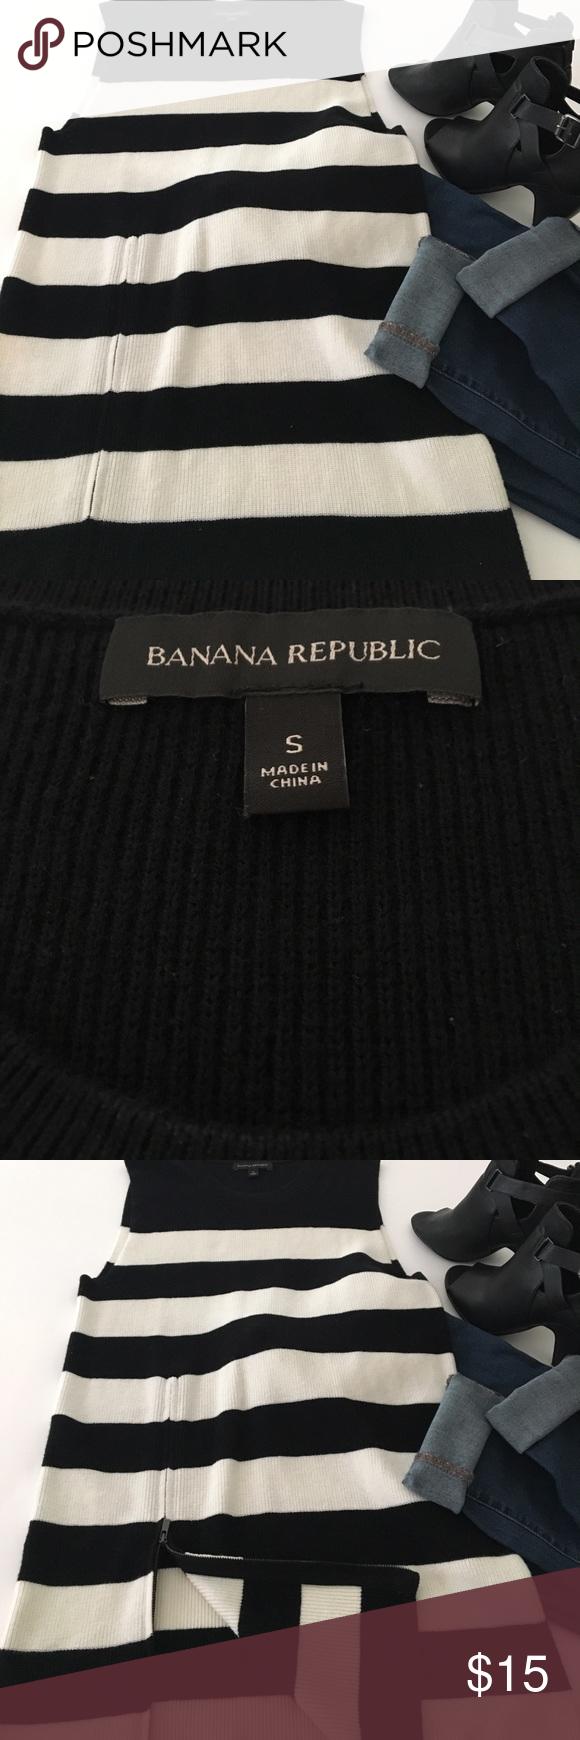 Beautiful Banana Republic Tunic Sweater | Online stock, Wide ...